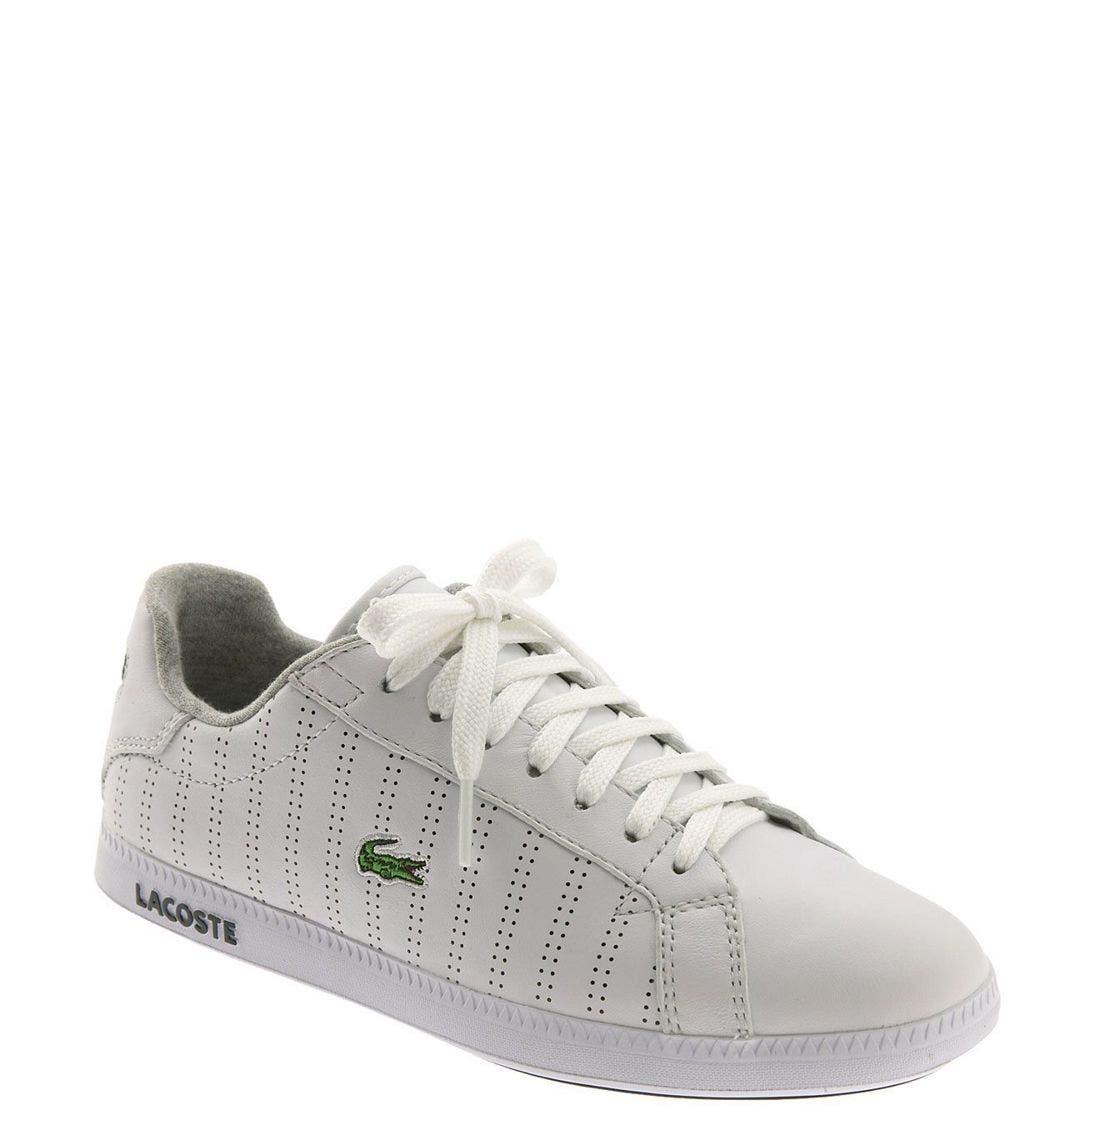 Alternate Image 1 Selected - Lacoste 'Graduate' Pinstripe Sneaker